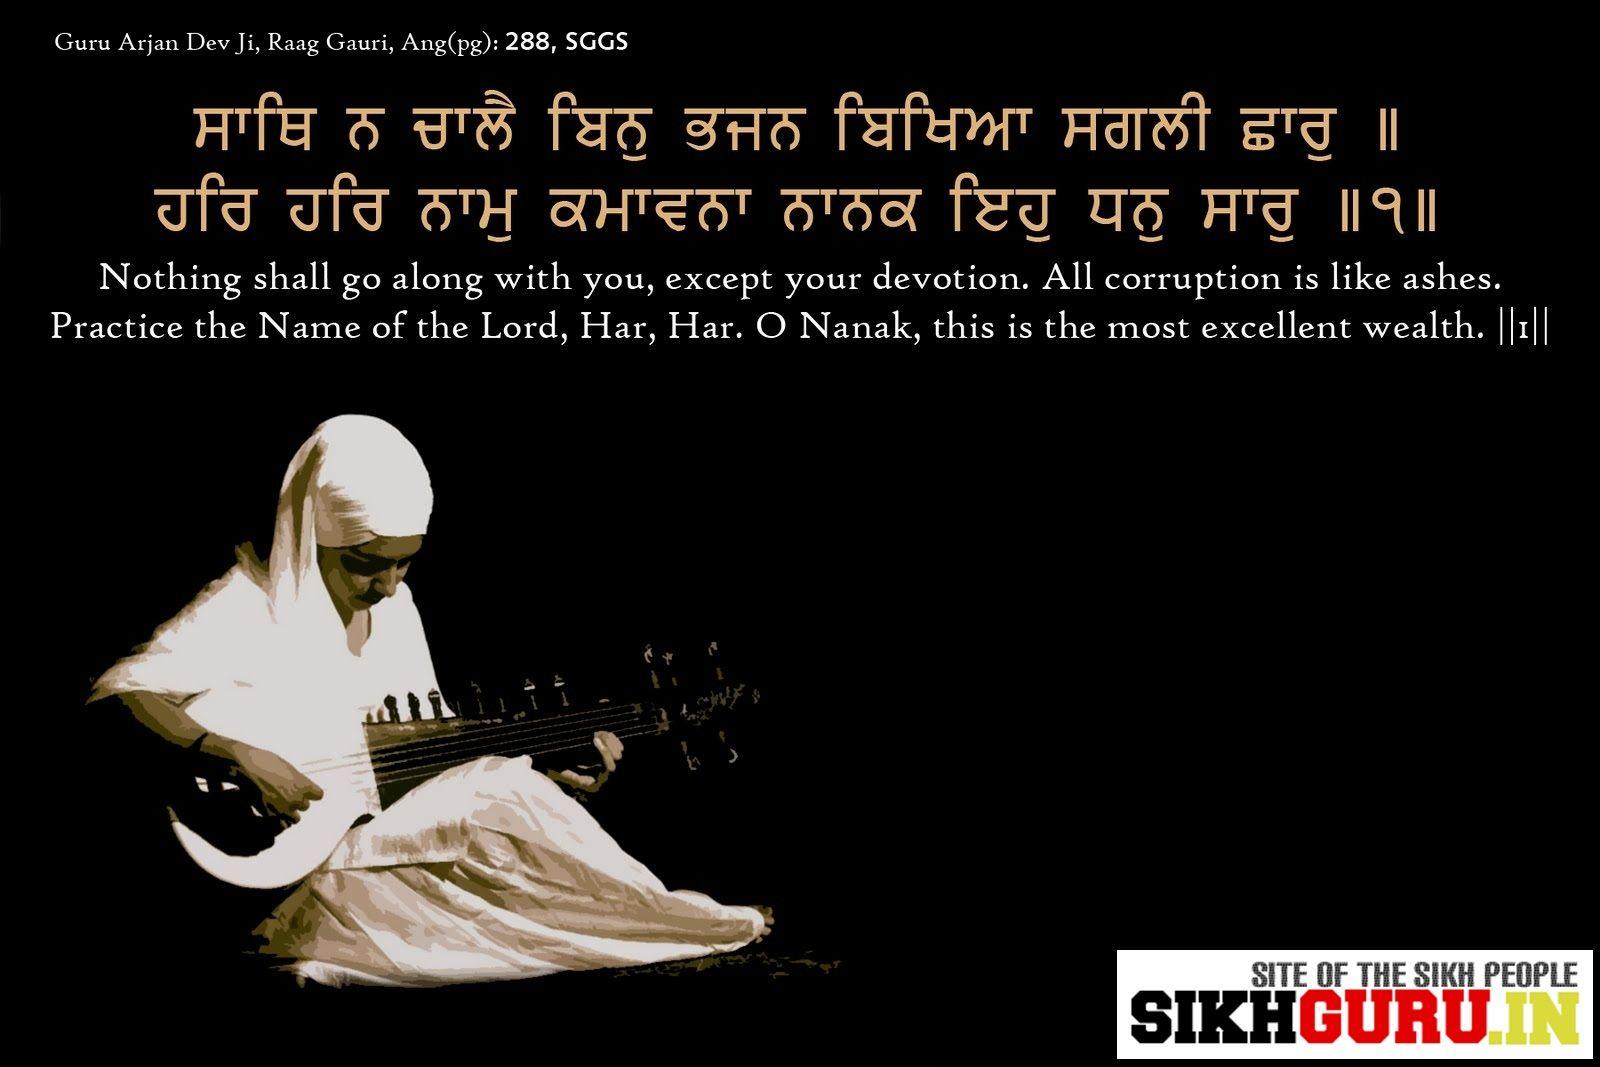 Radha Soami Quotes Wallpaper Guru Arjun Dev Ji Sikh Quotes Pinterest Wealth